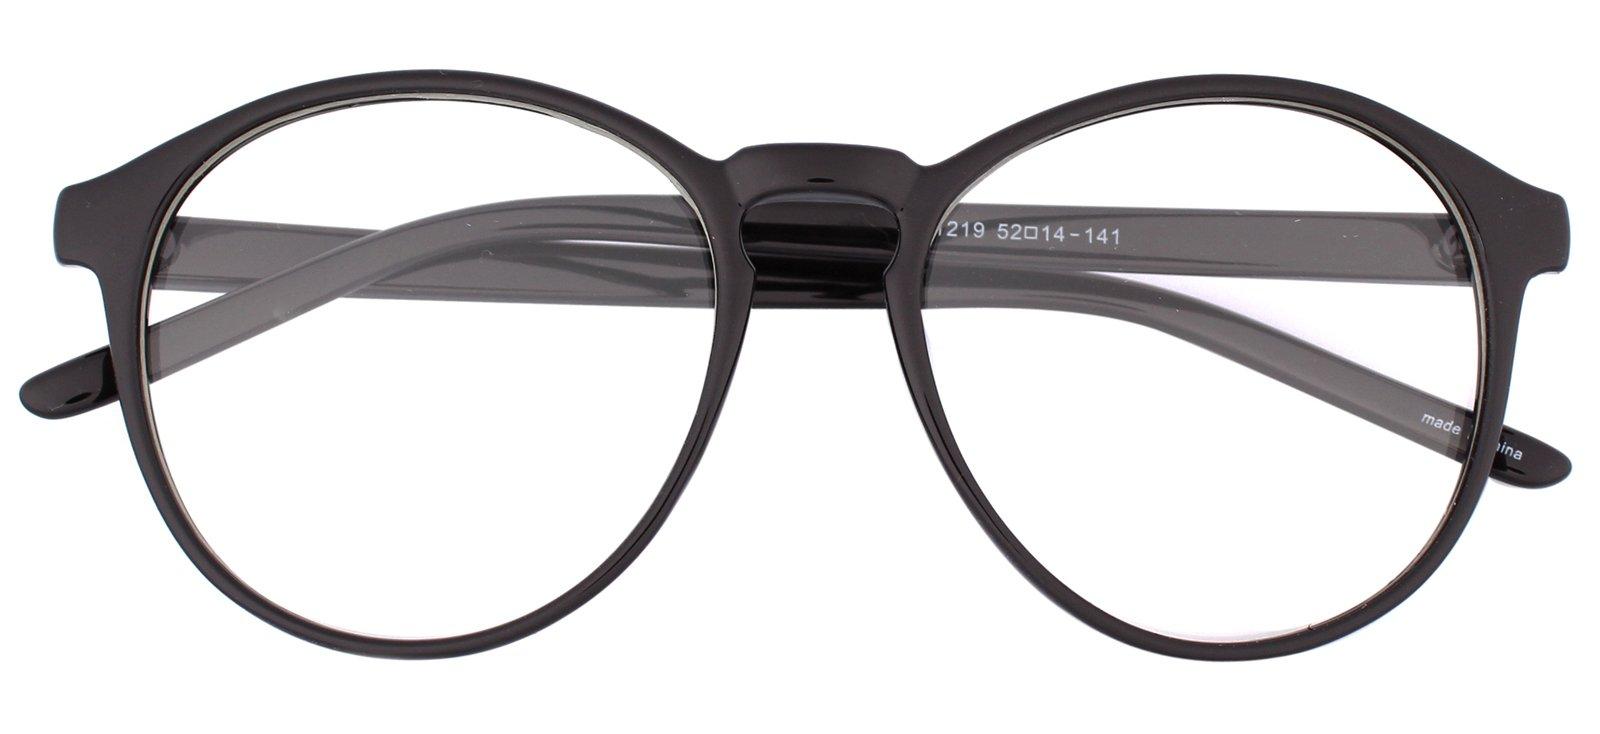 d42e0fd720d Galleon - Oversized Big Round Horn Rimmed Eye Glasses Clear Lens Oval Frame  Non Prescription (Glossy Black 12194)